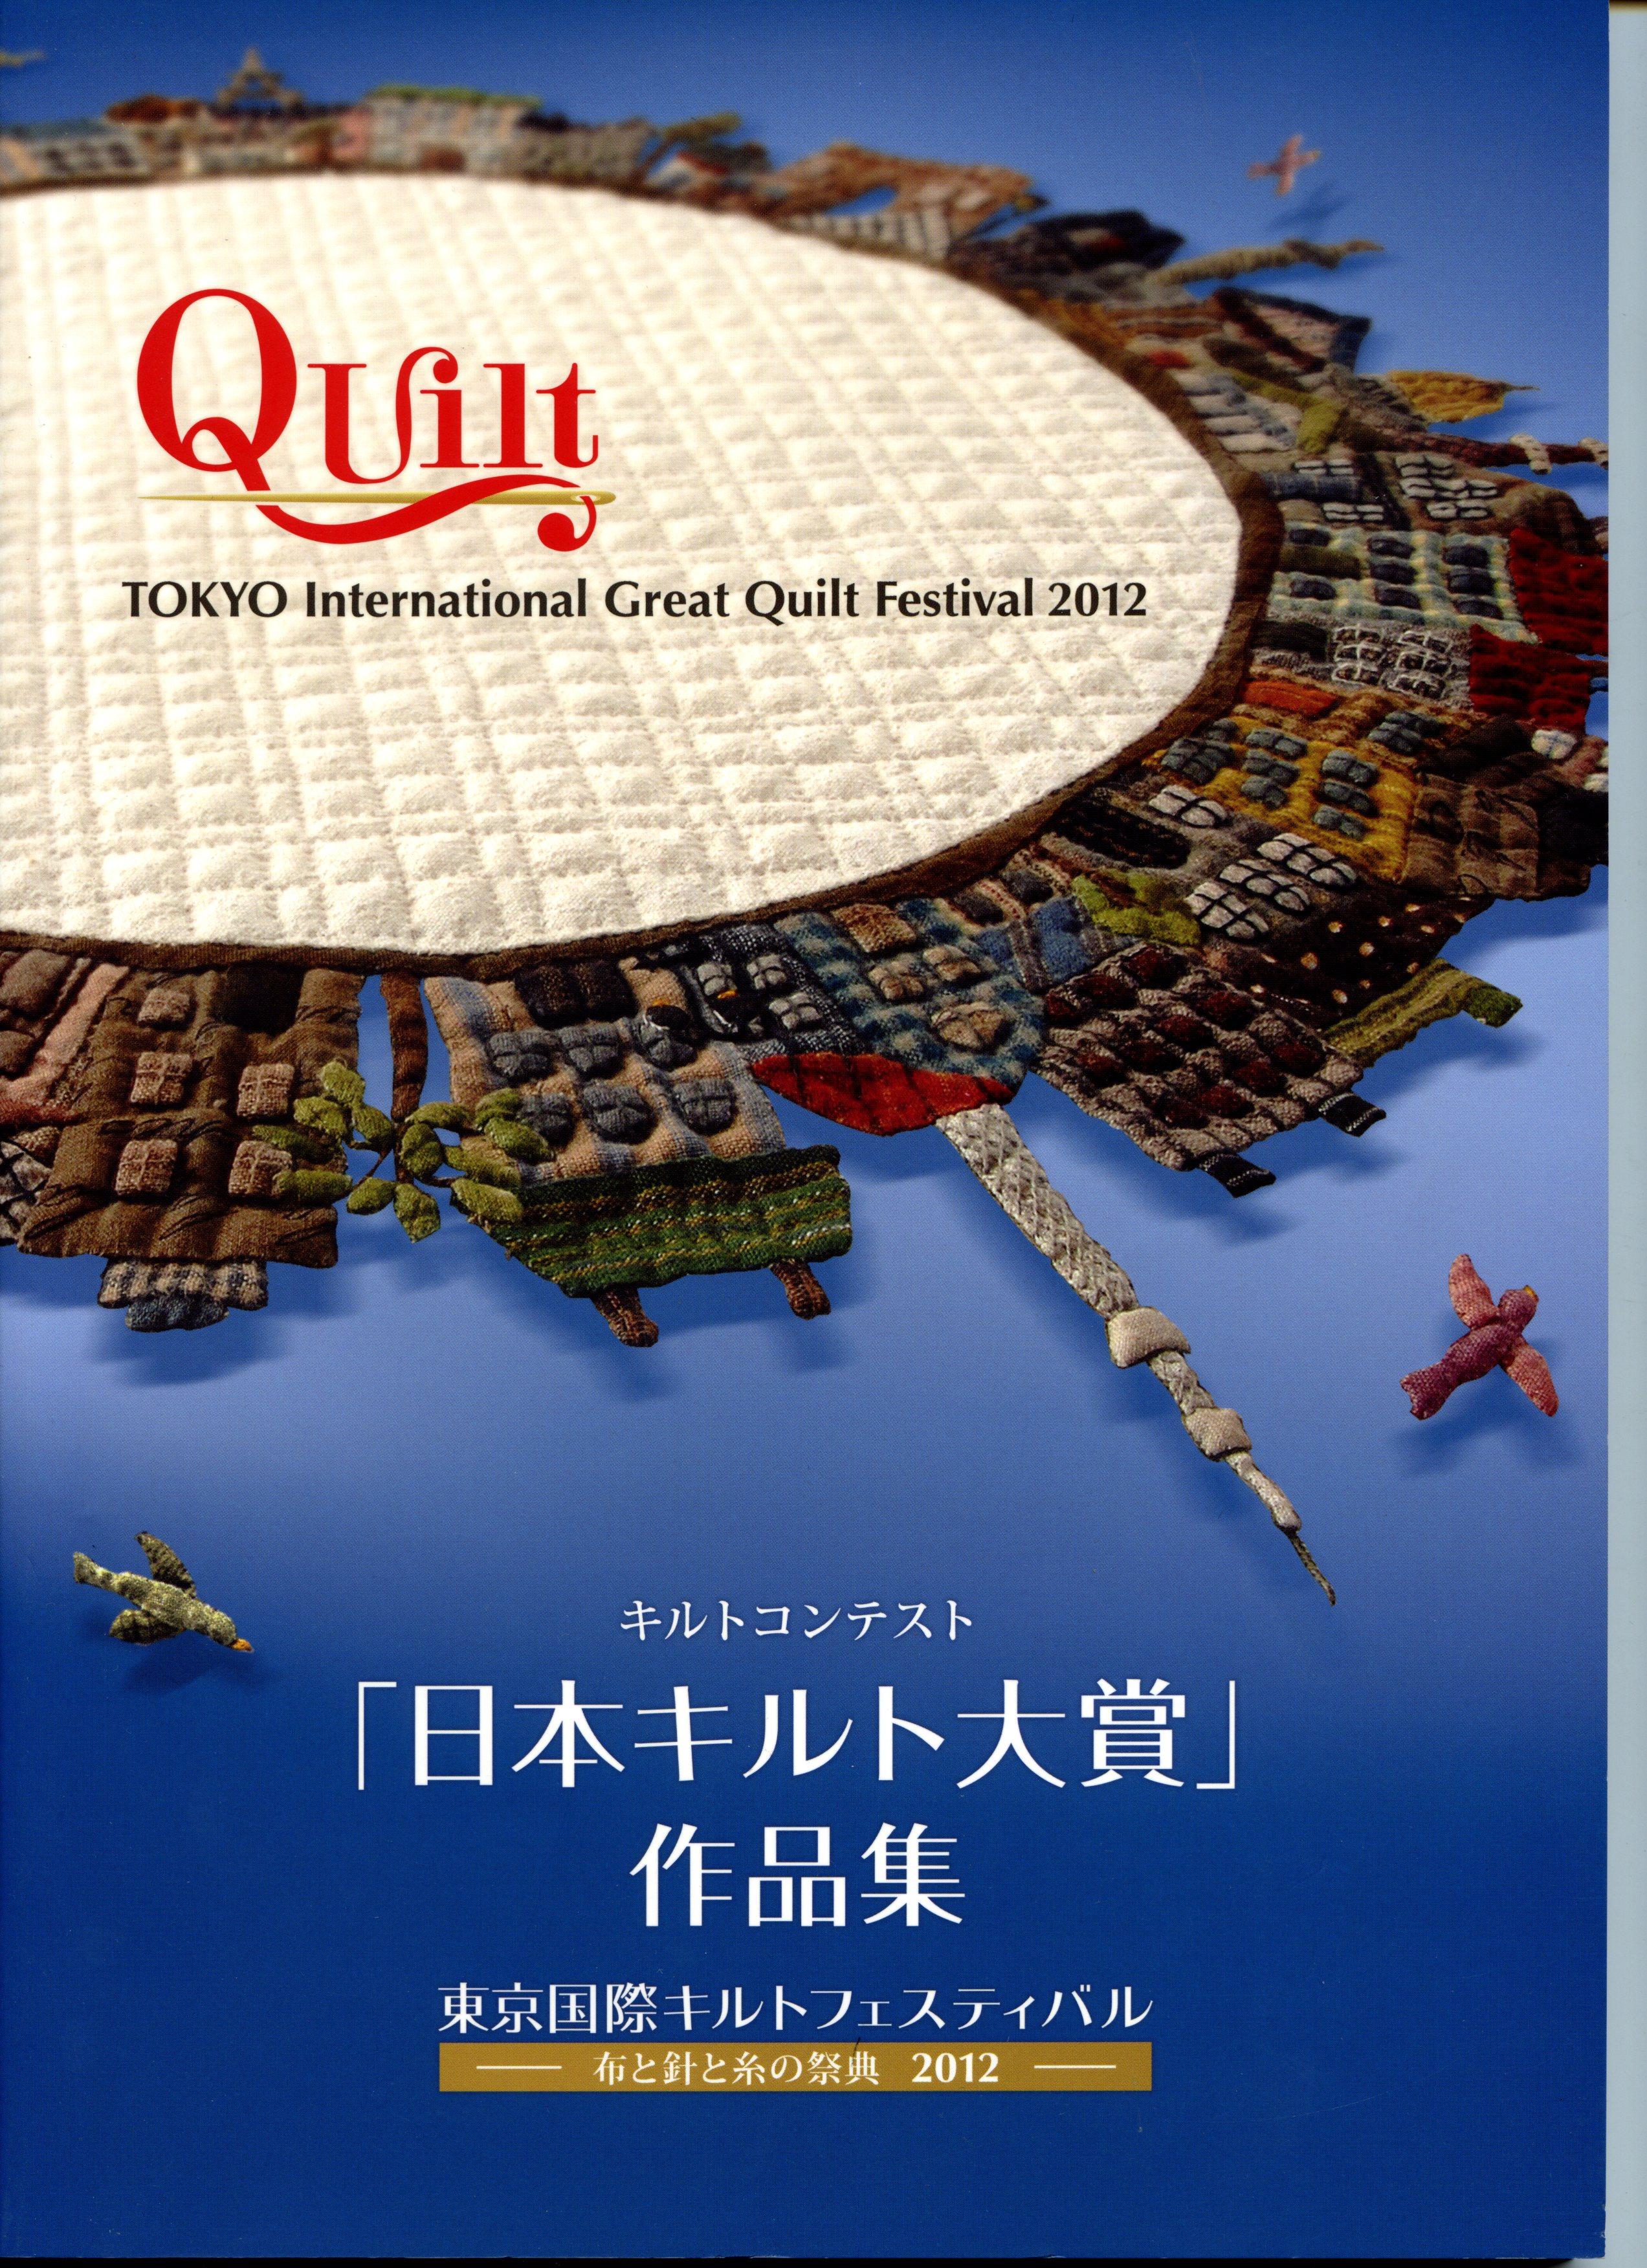 Tokyo Quilt Festival 2012